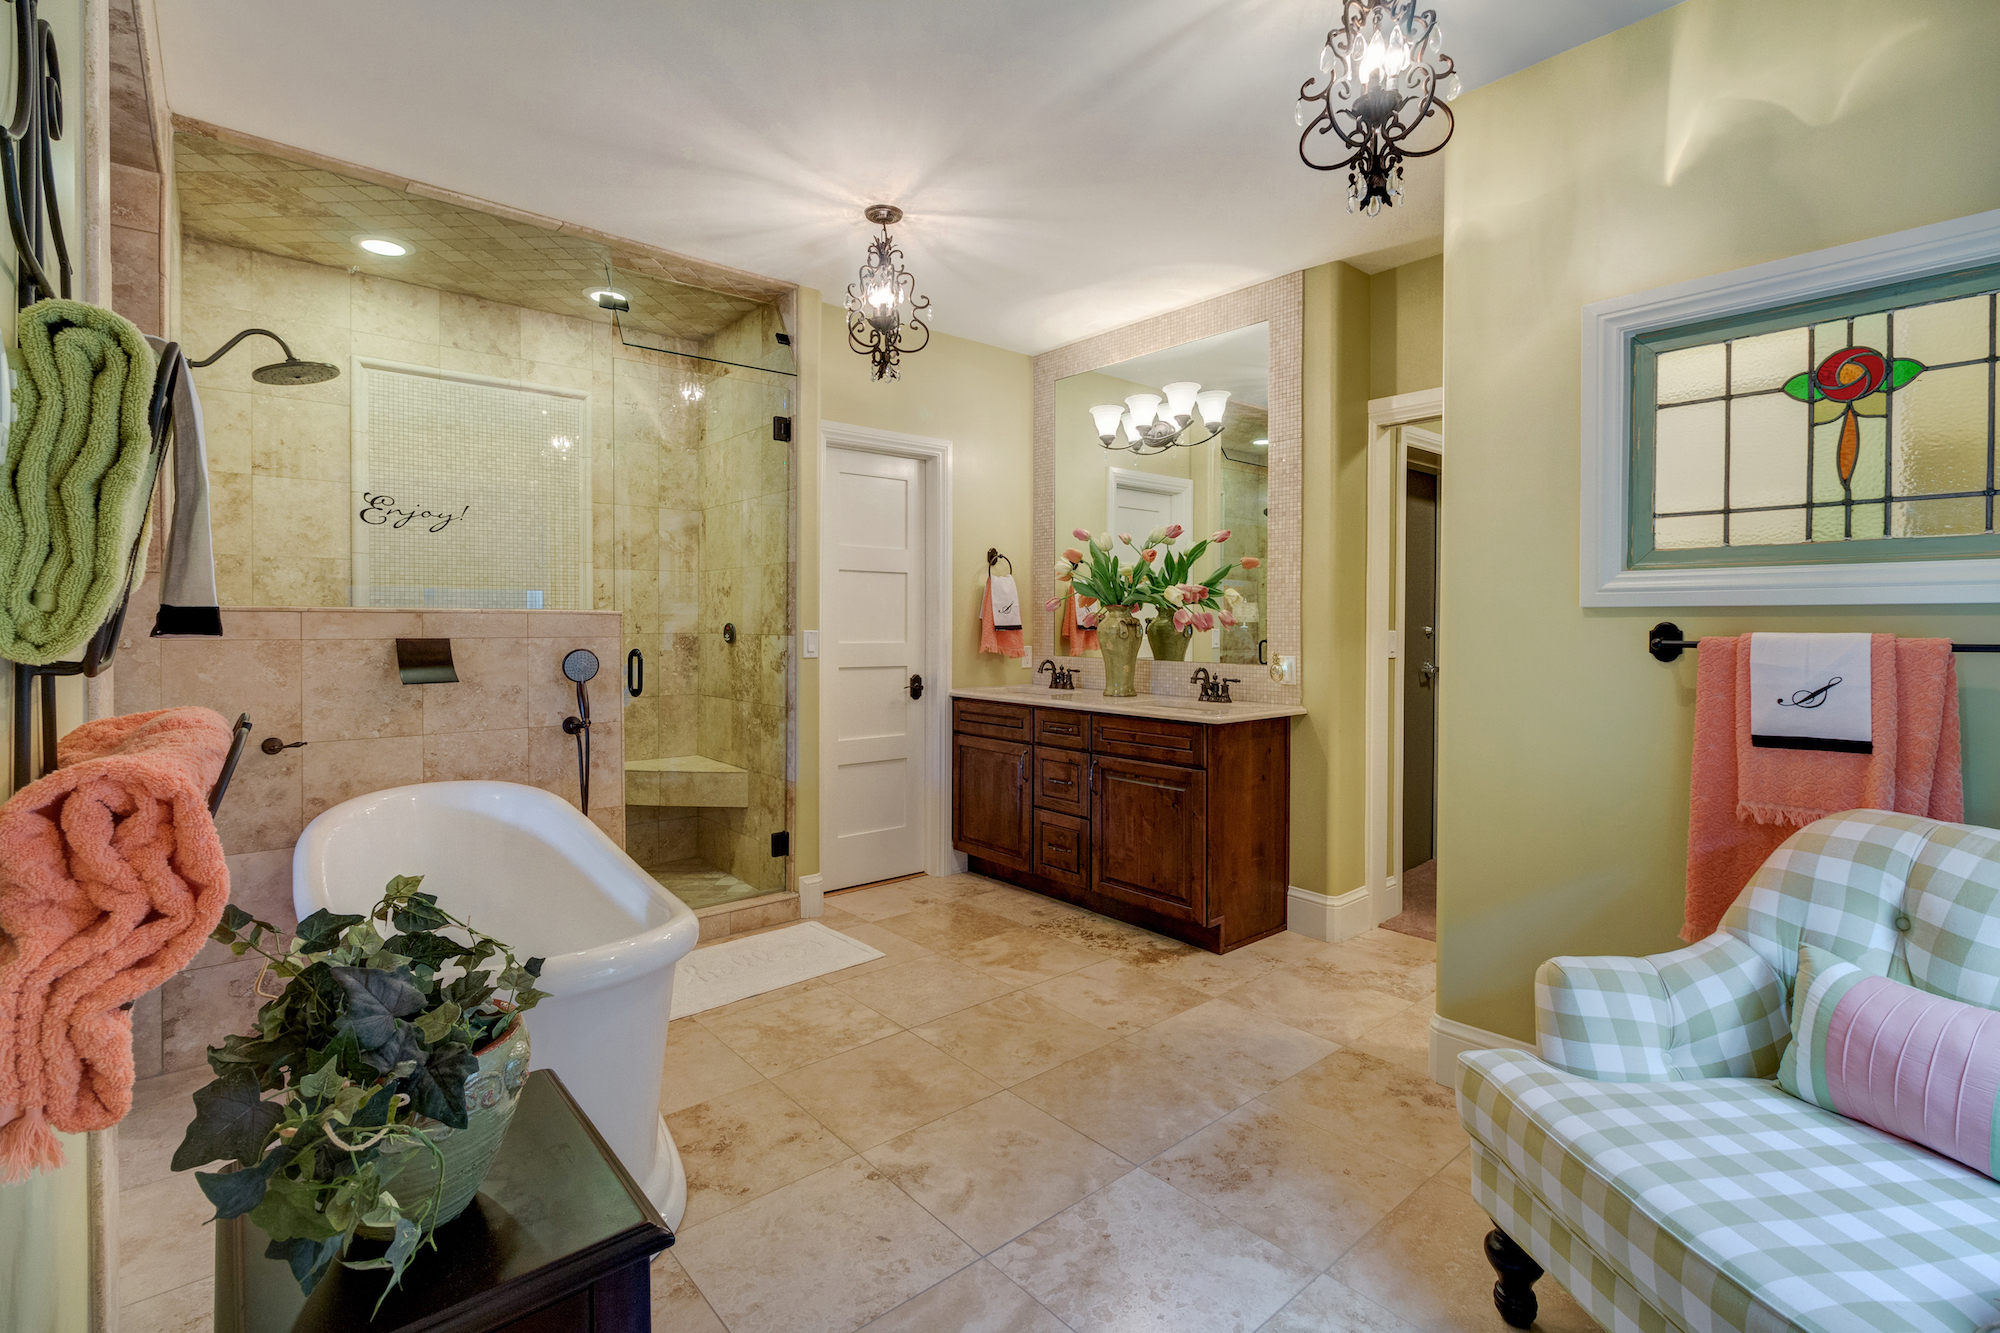 026-2nd master's bath w slipper tub and steam shower.jpg